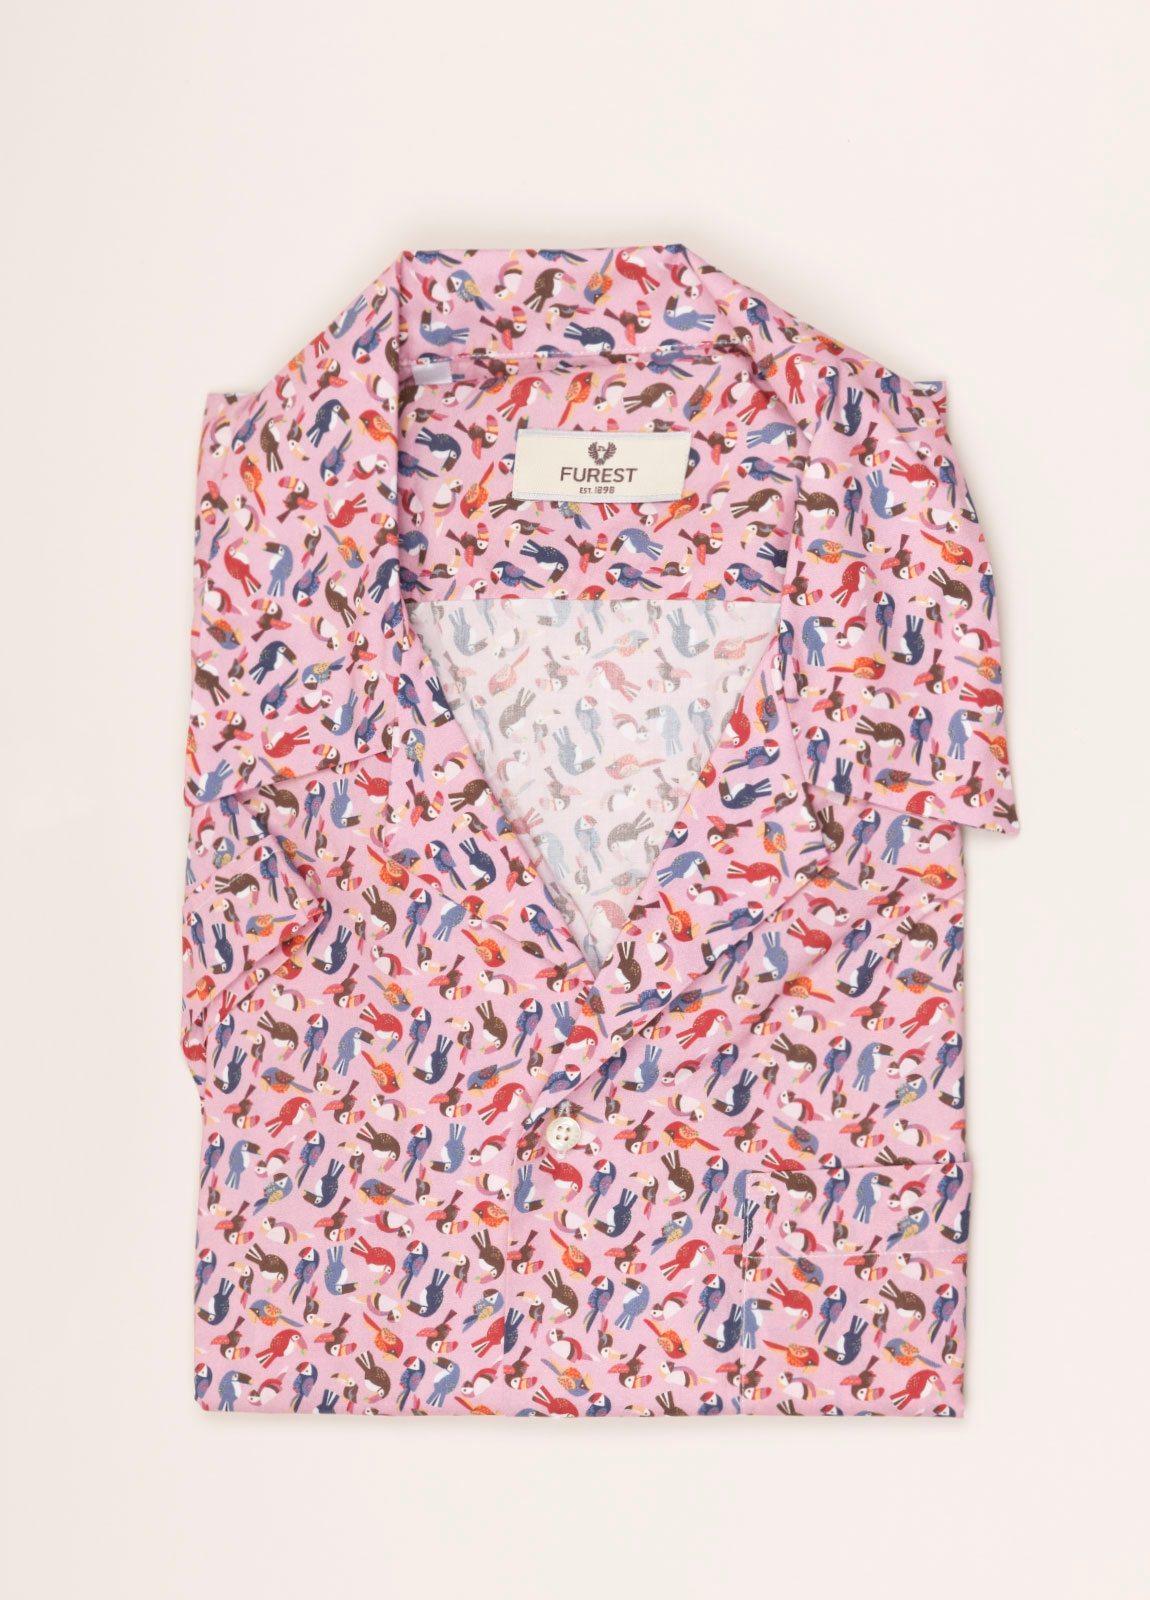 Camisa sport FUREST COLECCIÓN modelo HAWAI rosa - Ítem2